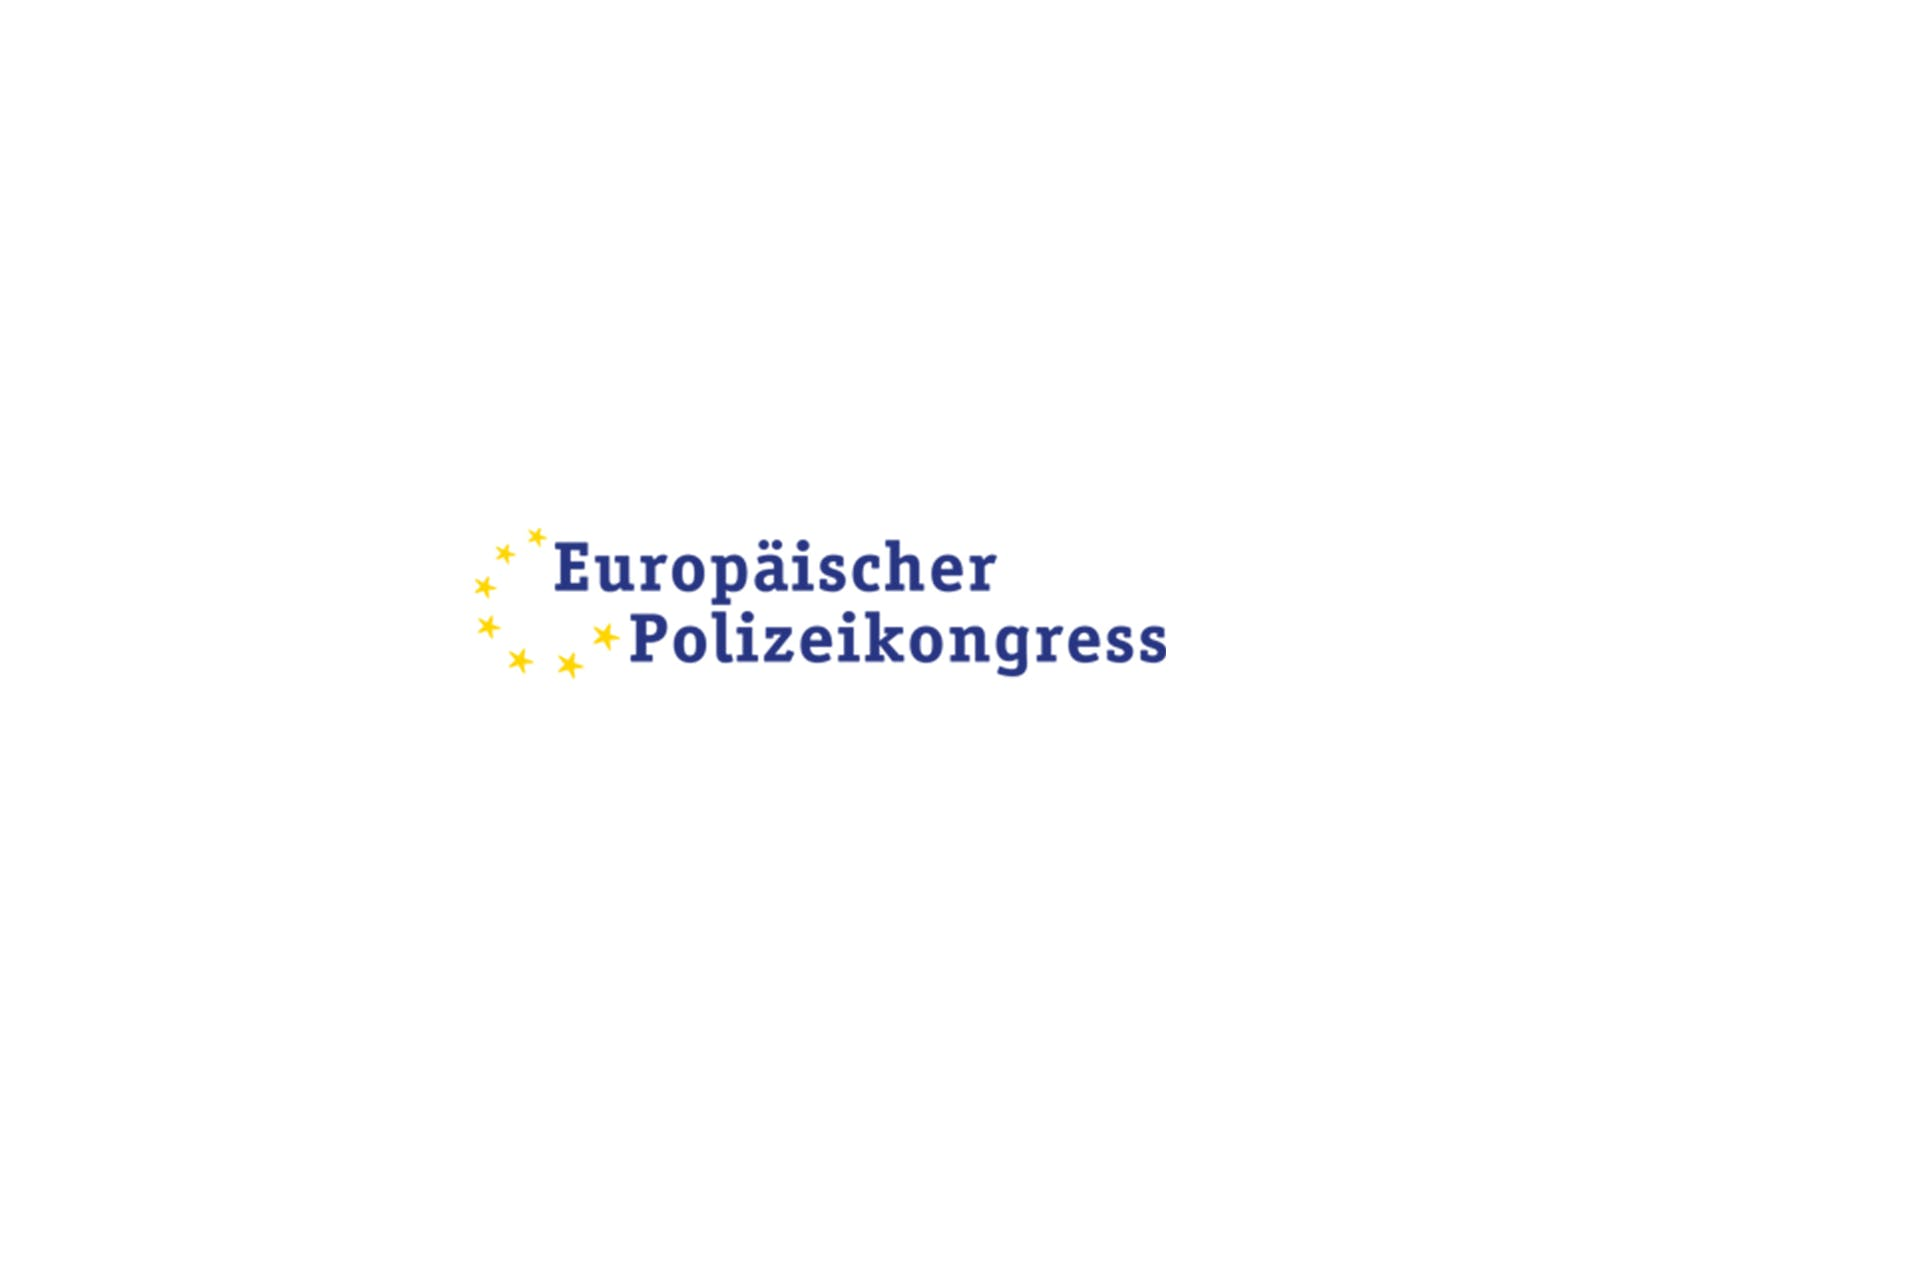 Europäischer Polizeikongress